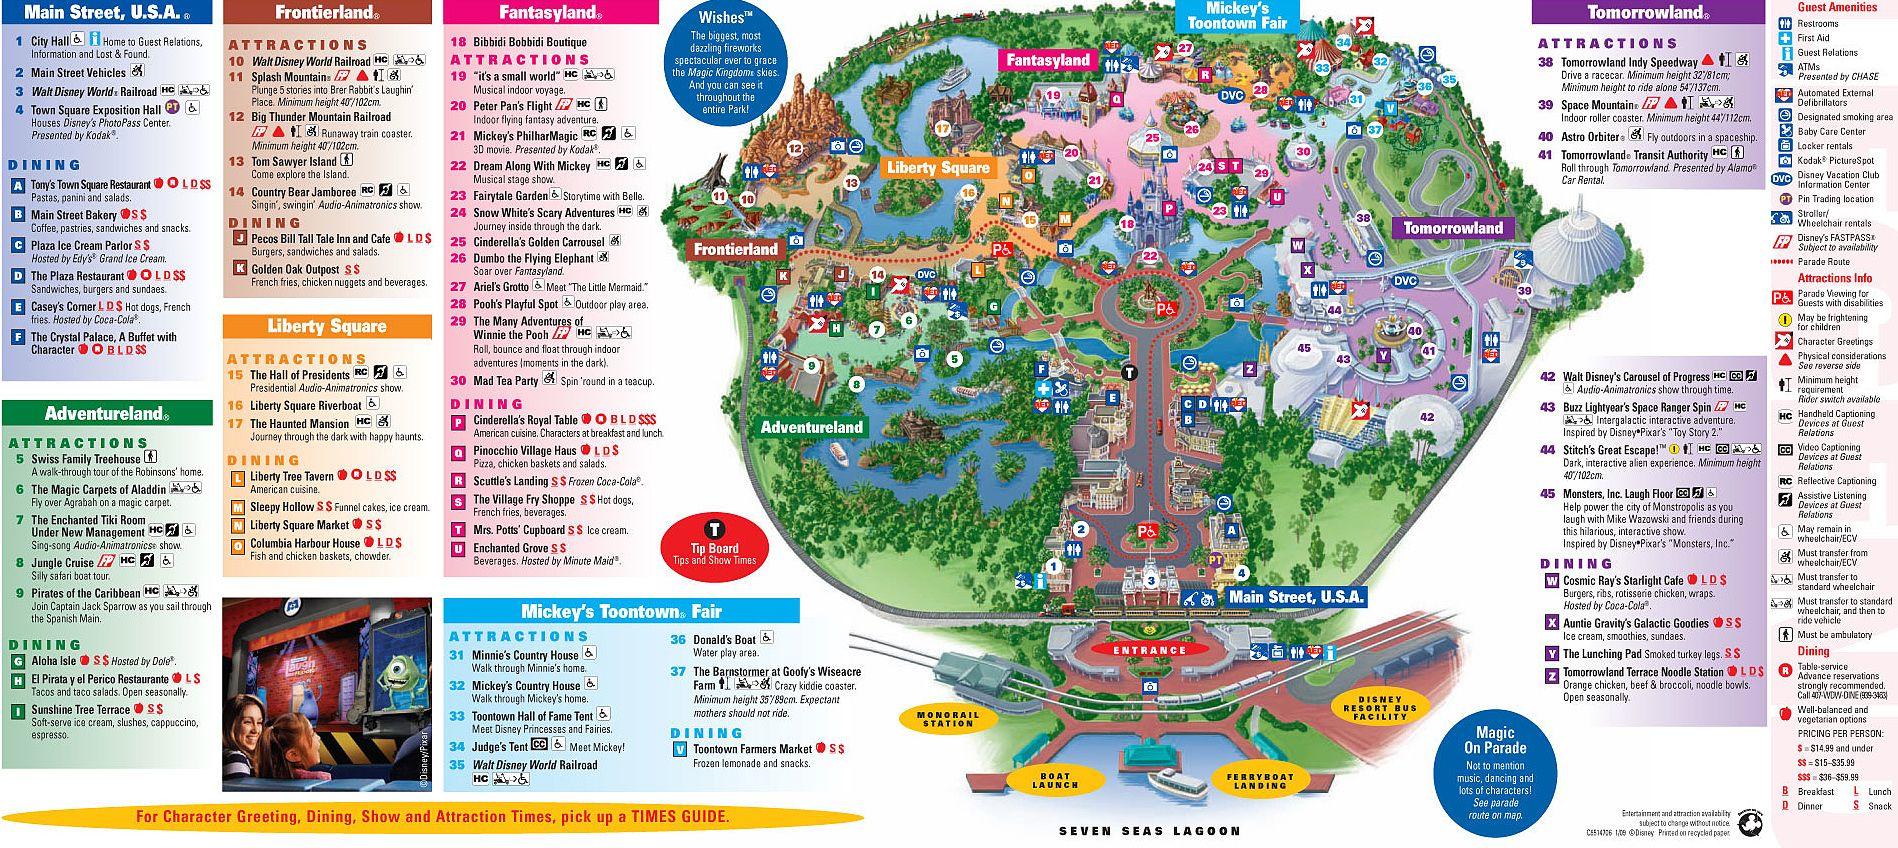 Walt Disney World Magic Kingdom Map Pin by Kathy Goldstein on Disney Trip | Magic kingdom, Disney  Walt Disney World Magic Kingdom Map